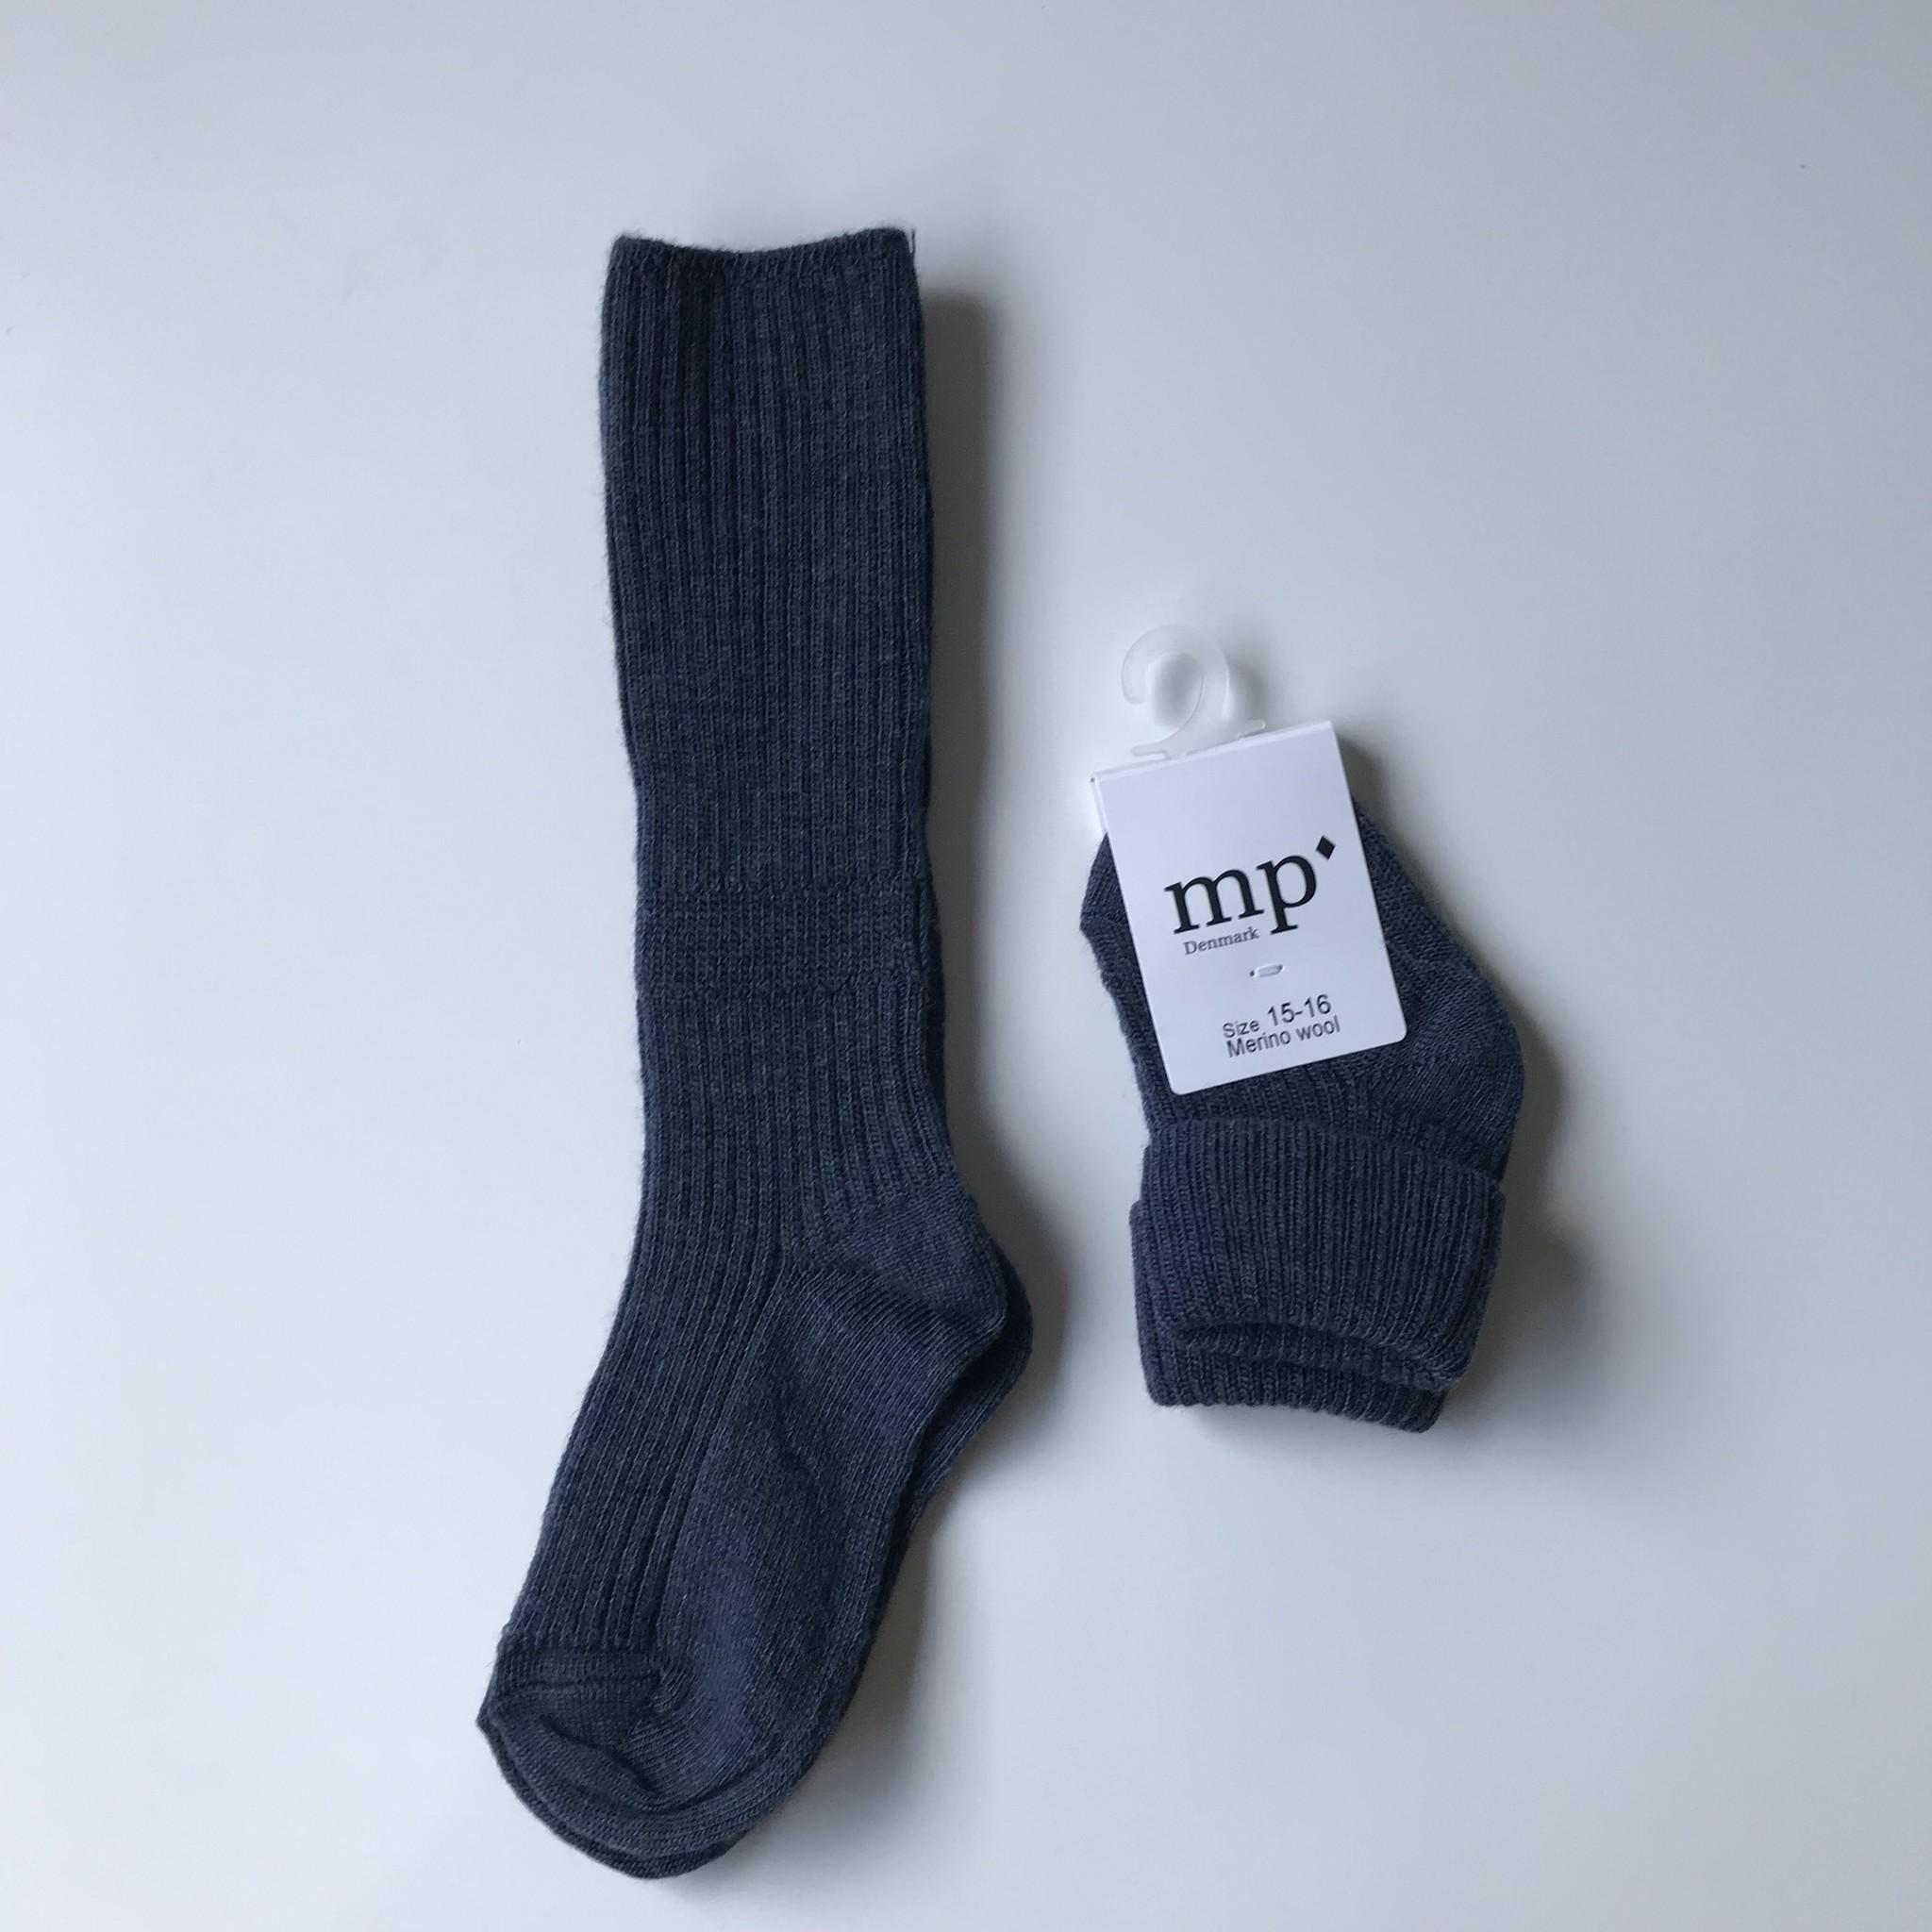 MP Denmark wollen kniekousjes - 80% merino wool - denim blauw - maat 15 tm 32